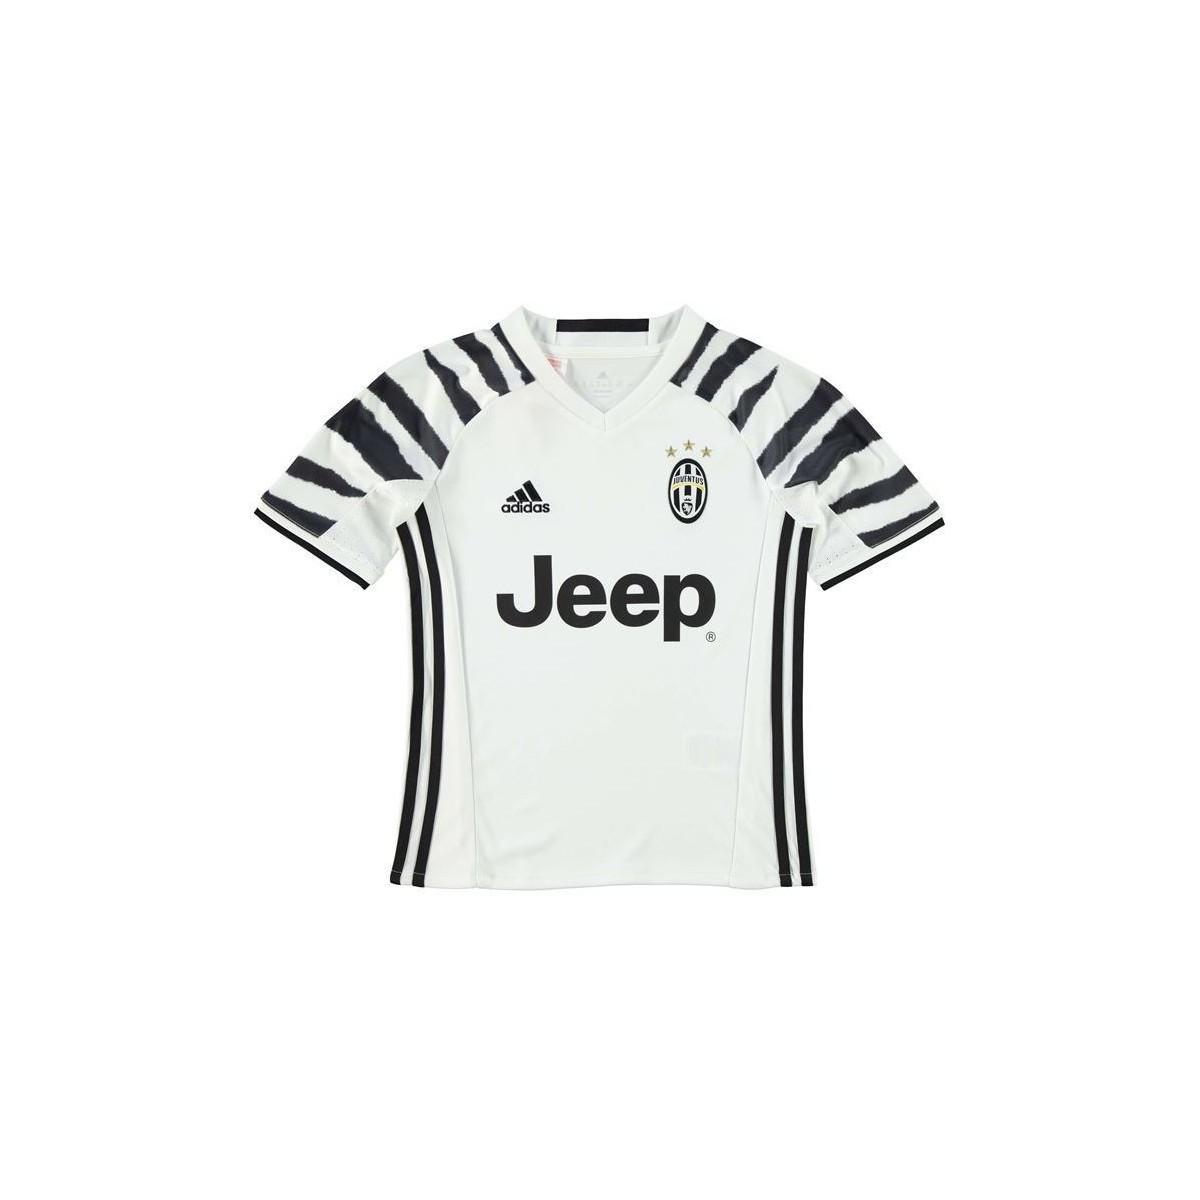 7579880d2d9 Adidas 2016-17 Juventus 3rd Shirt (higuain 9) - Kids Men s T Shirt ...